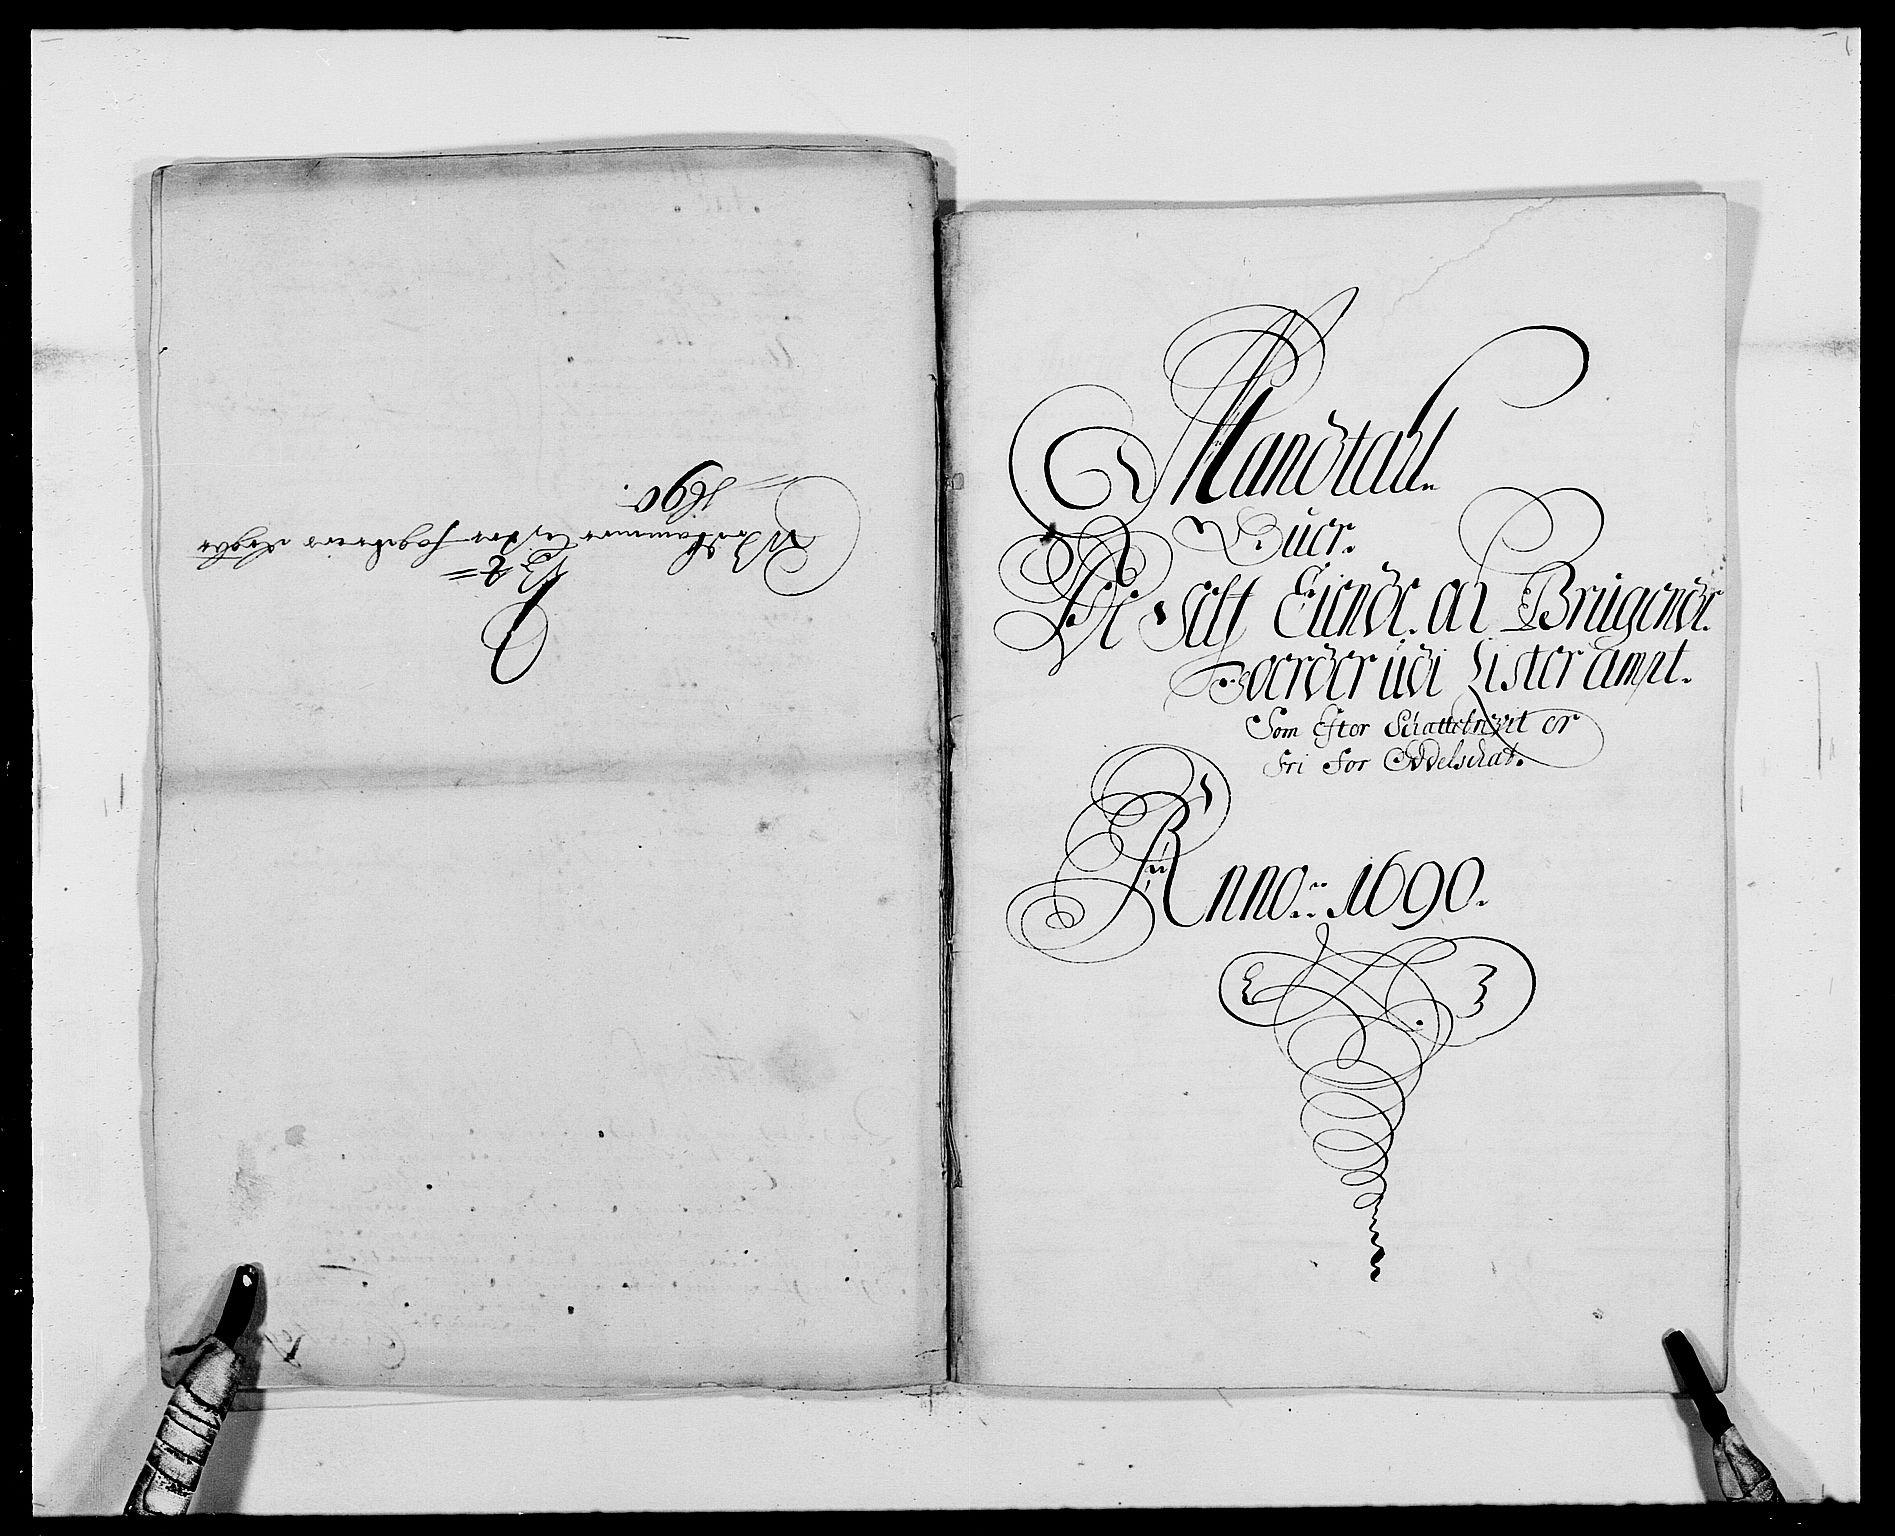 RA, Rentekammeret inntil 1814, Reviderte regnskaper, Fogderegnskap, R41/L2536: Fogderegnskap Lista, 1690-1693, s. 78